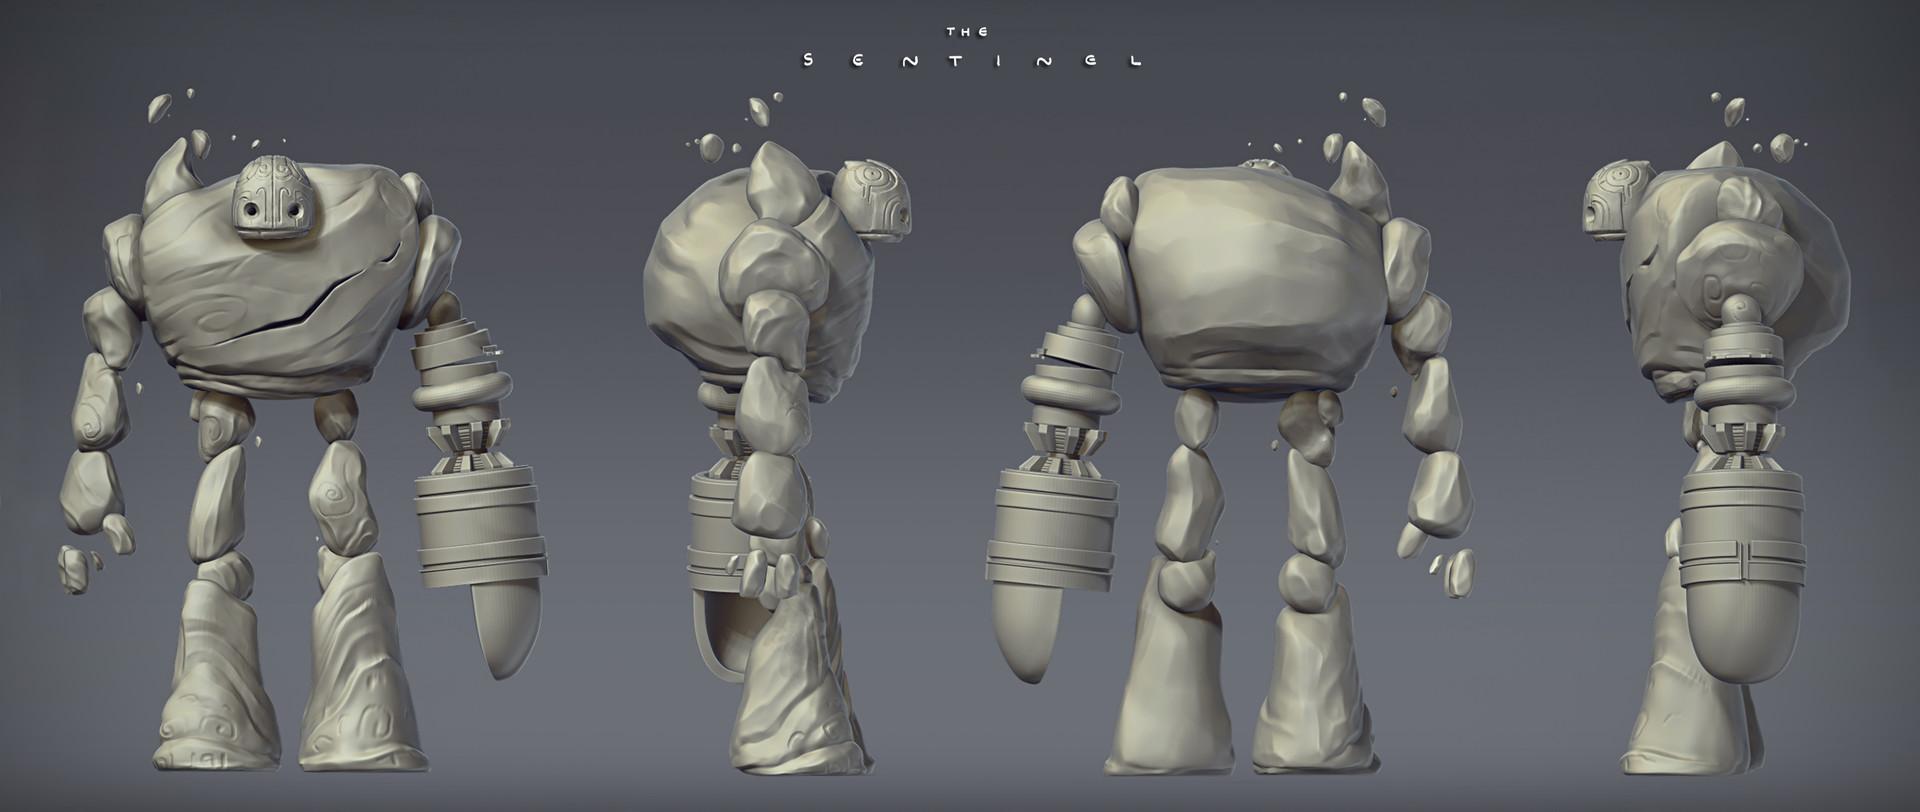 Tyler bolyard sentinelsculpt